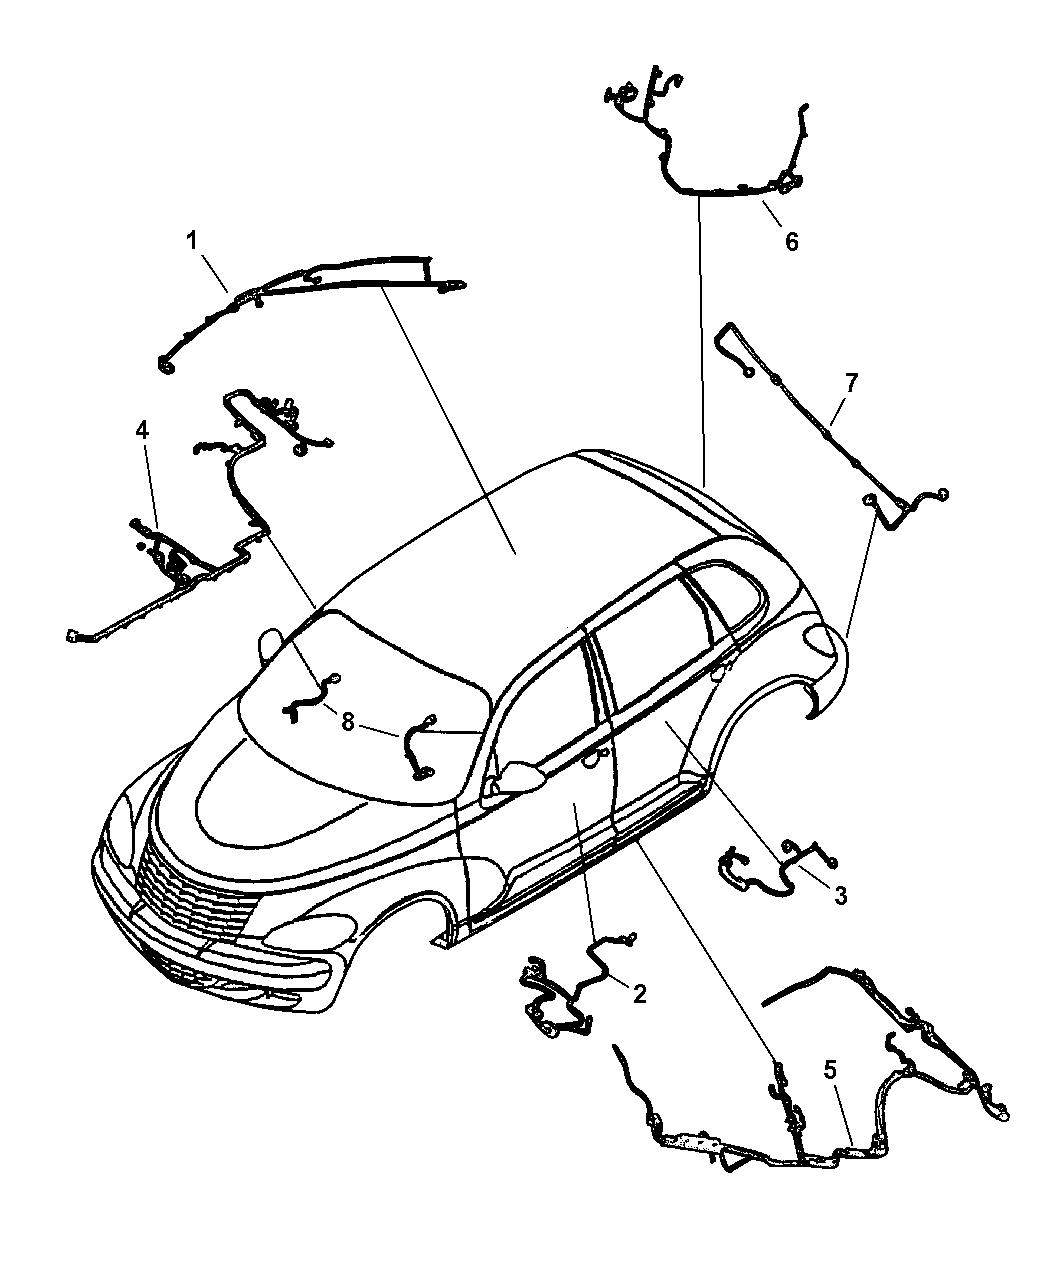 2001 Chrysler PT Cruiser Wiring Body & Accessory